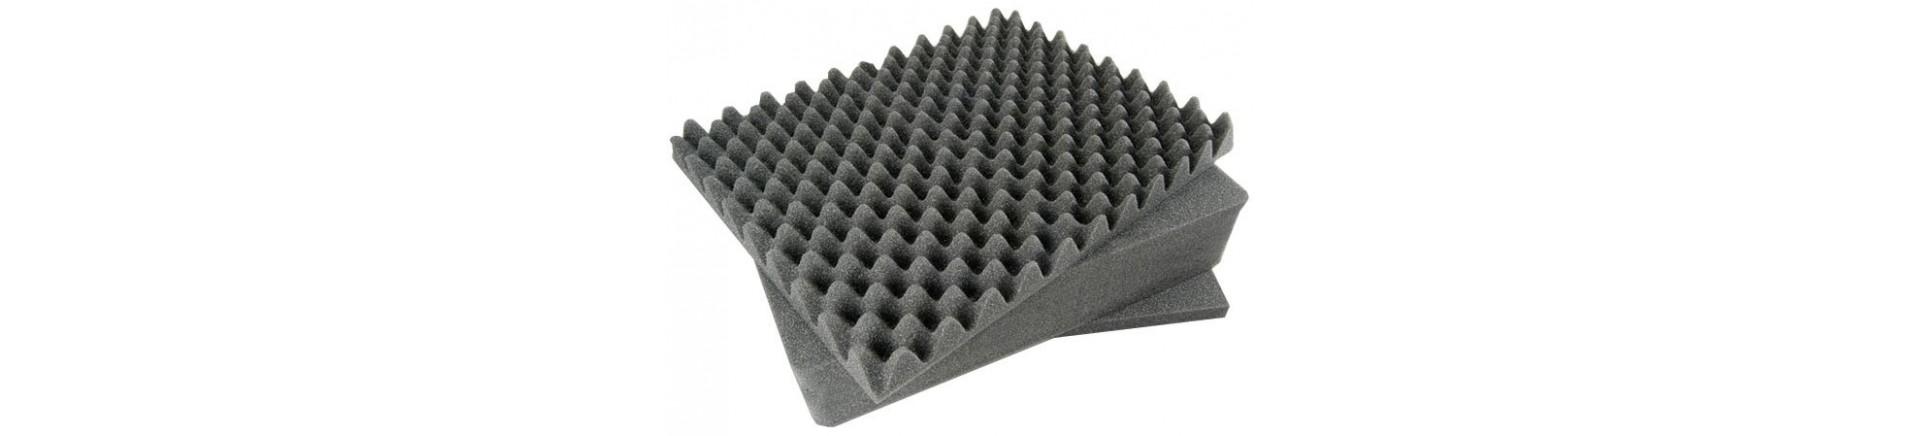 1485 Foam Set 014850-4000-000E Air Accessories shop.k-teg.com